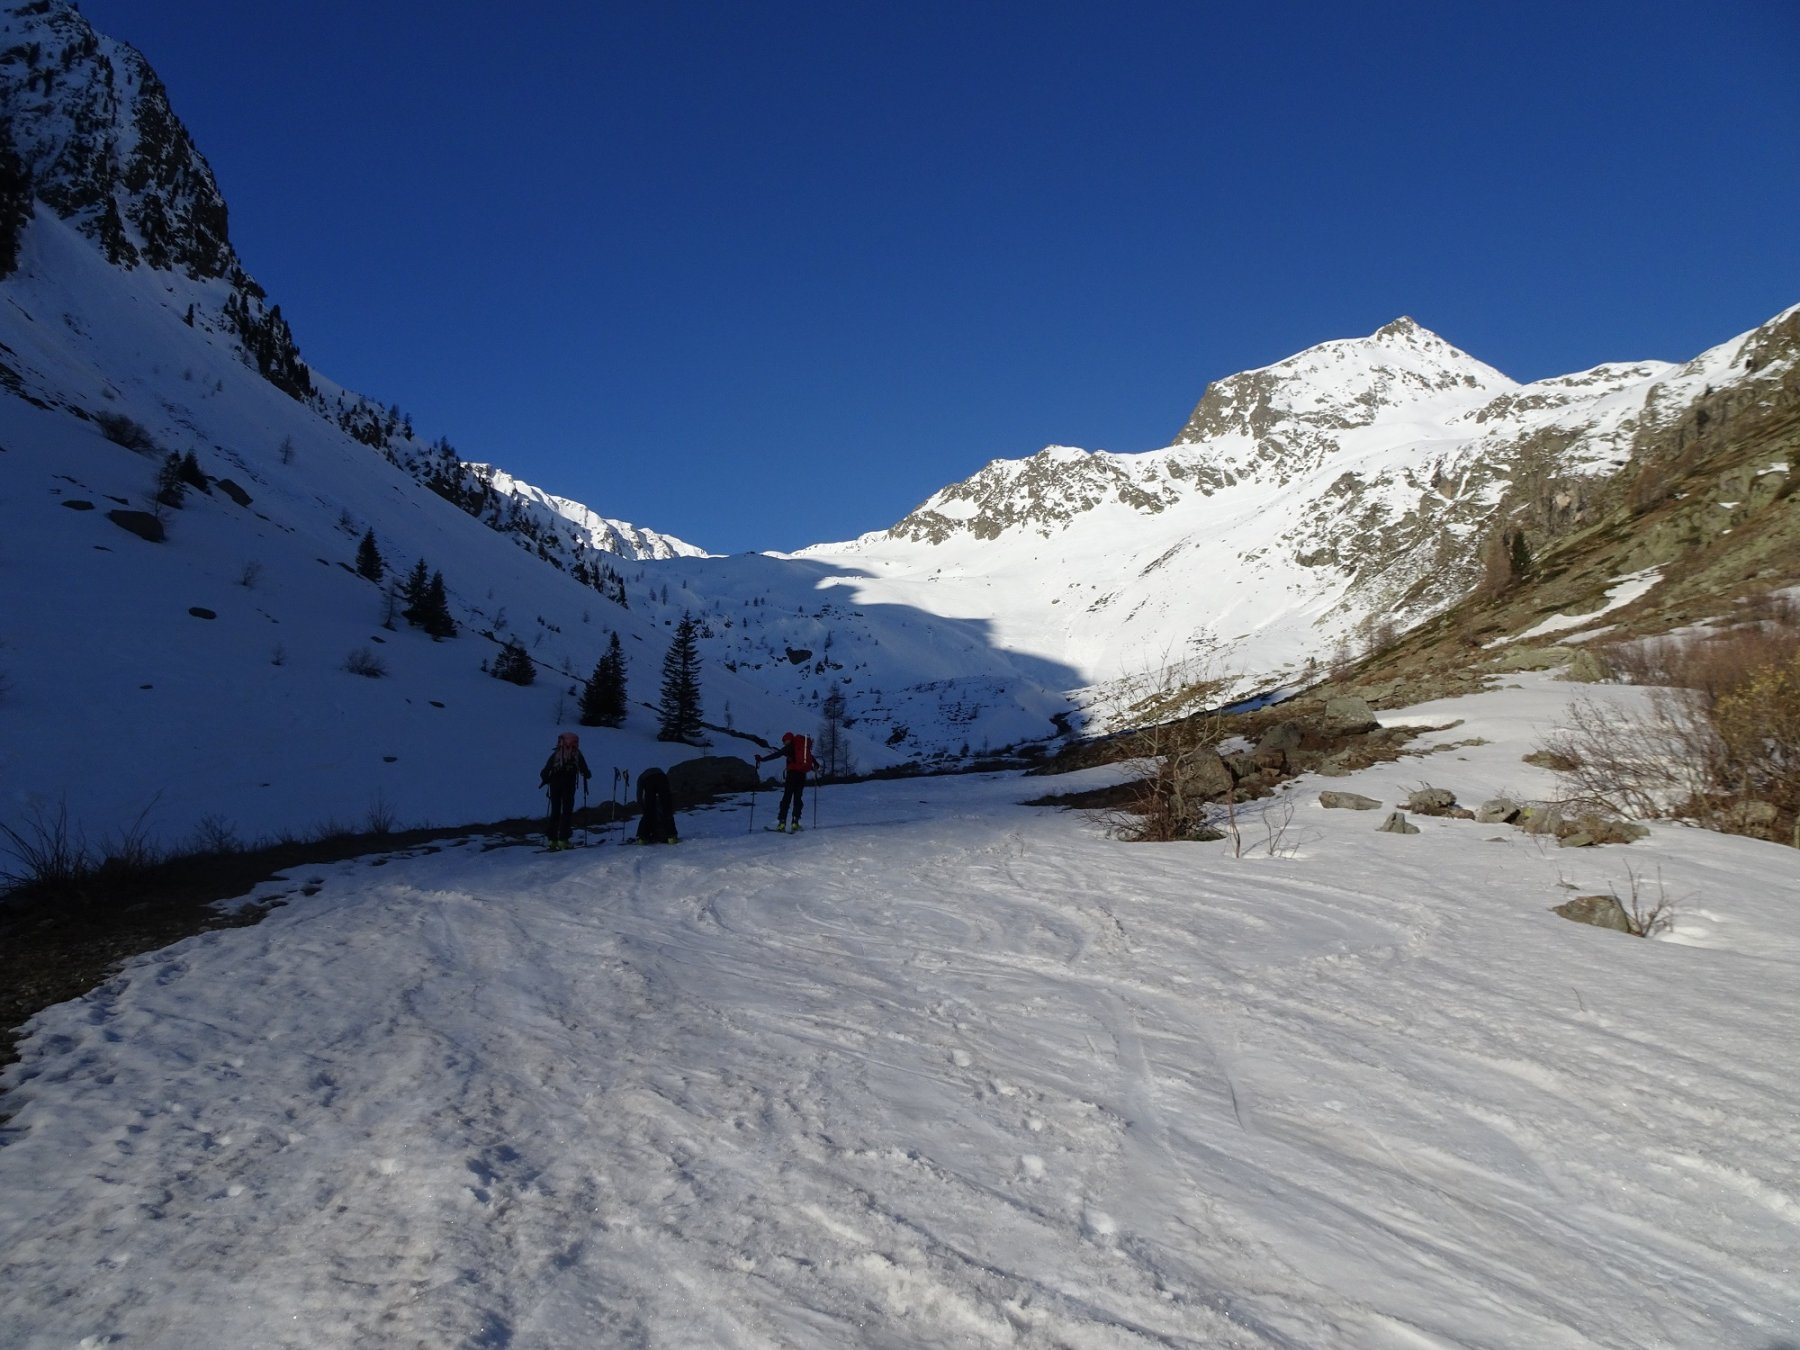 Si calzano gli sci in salita